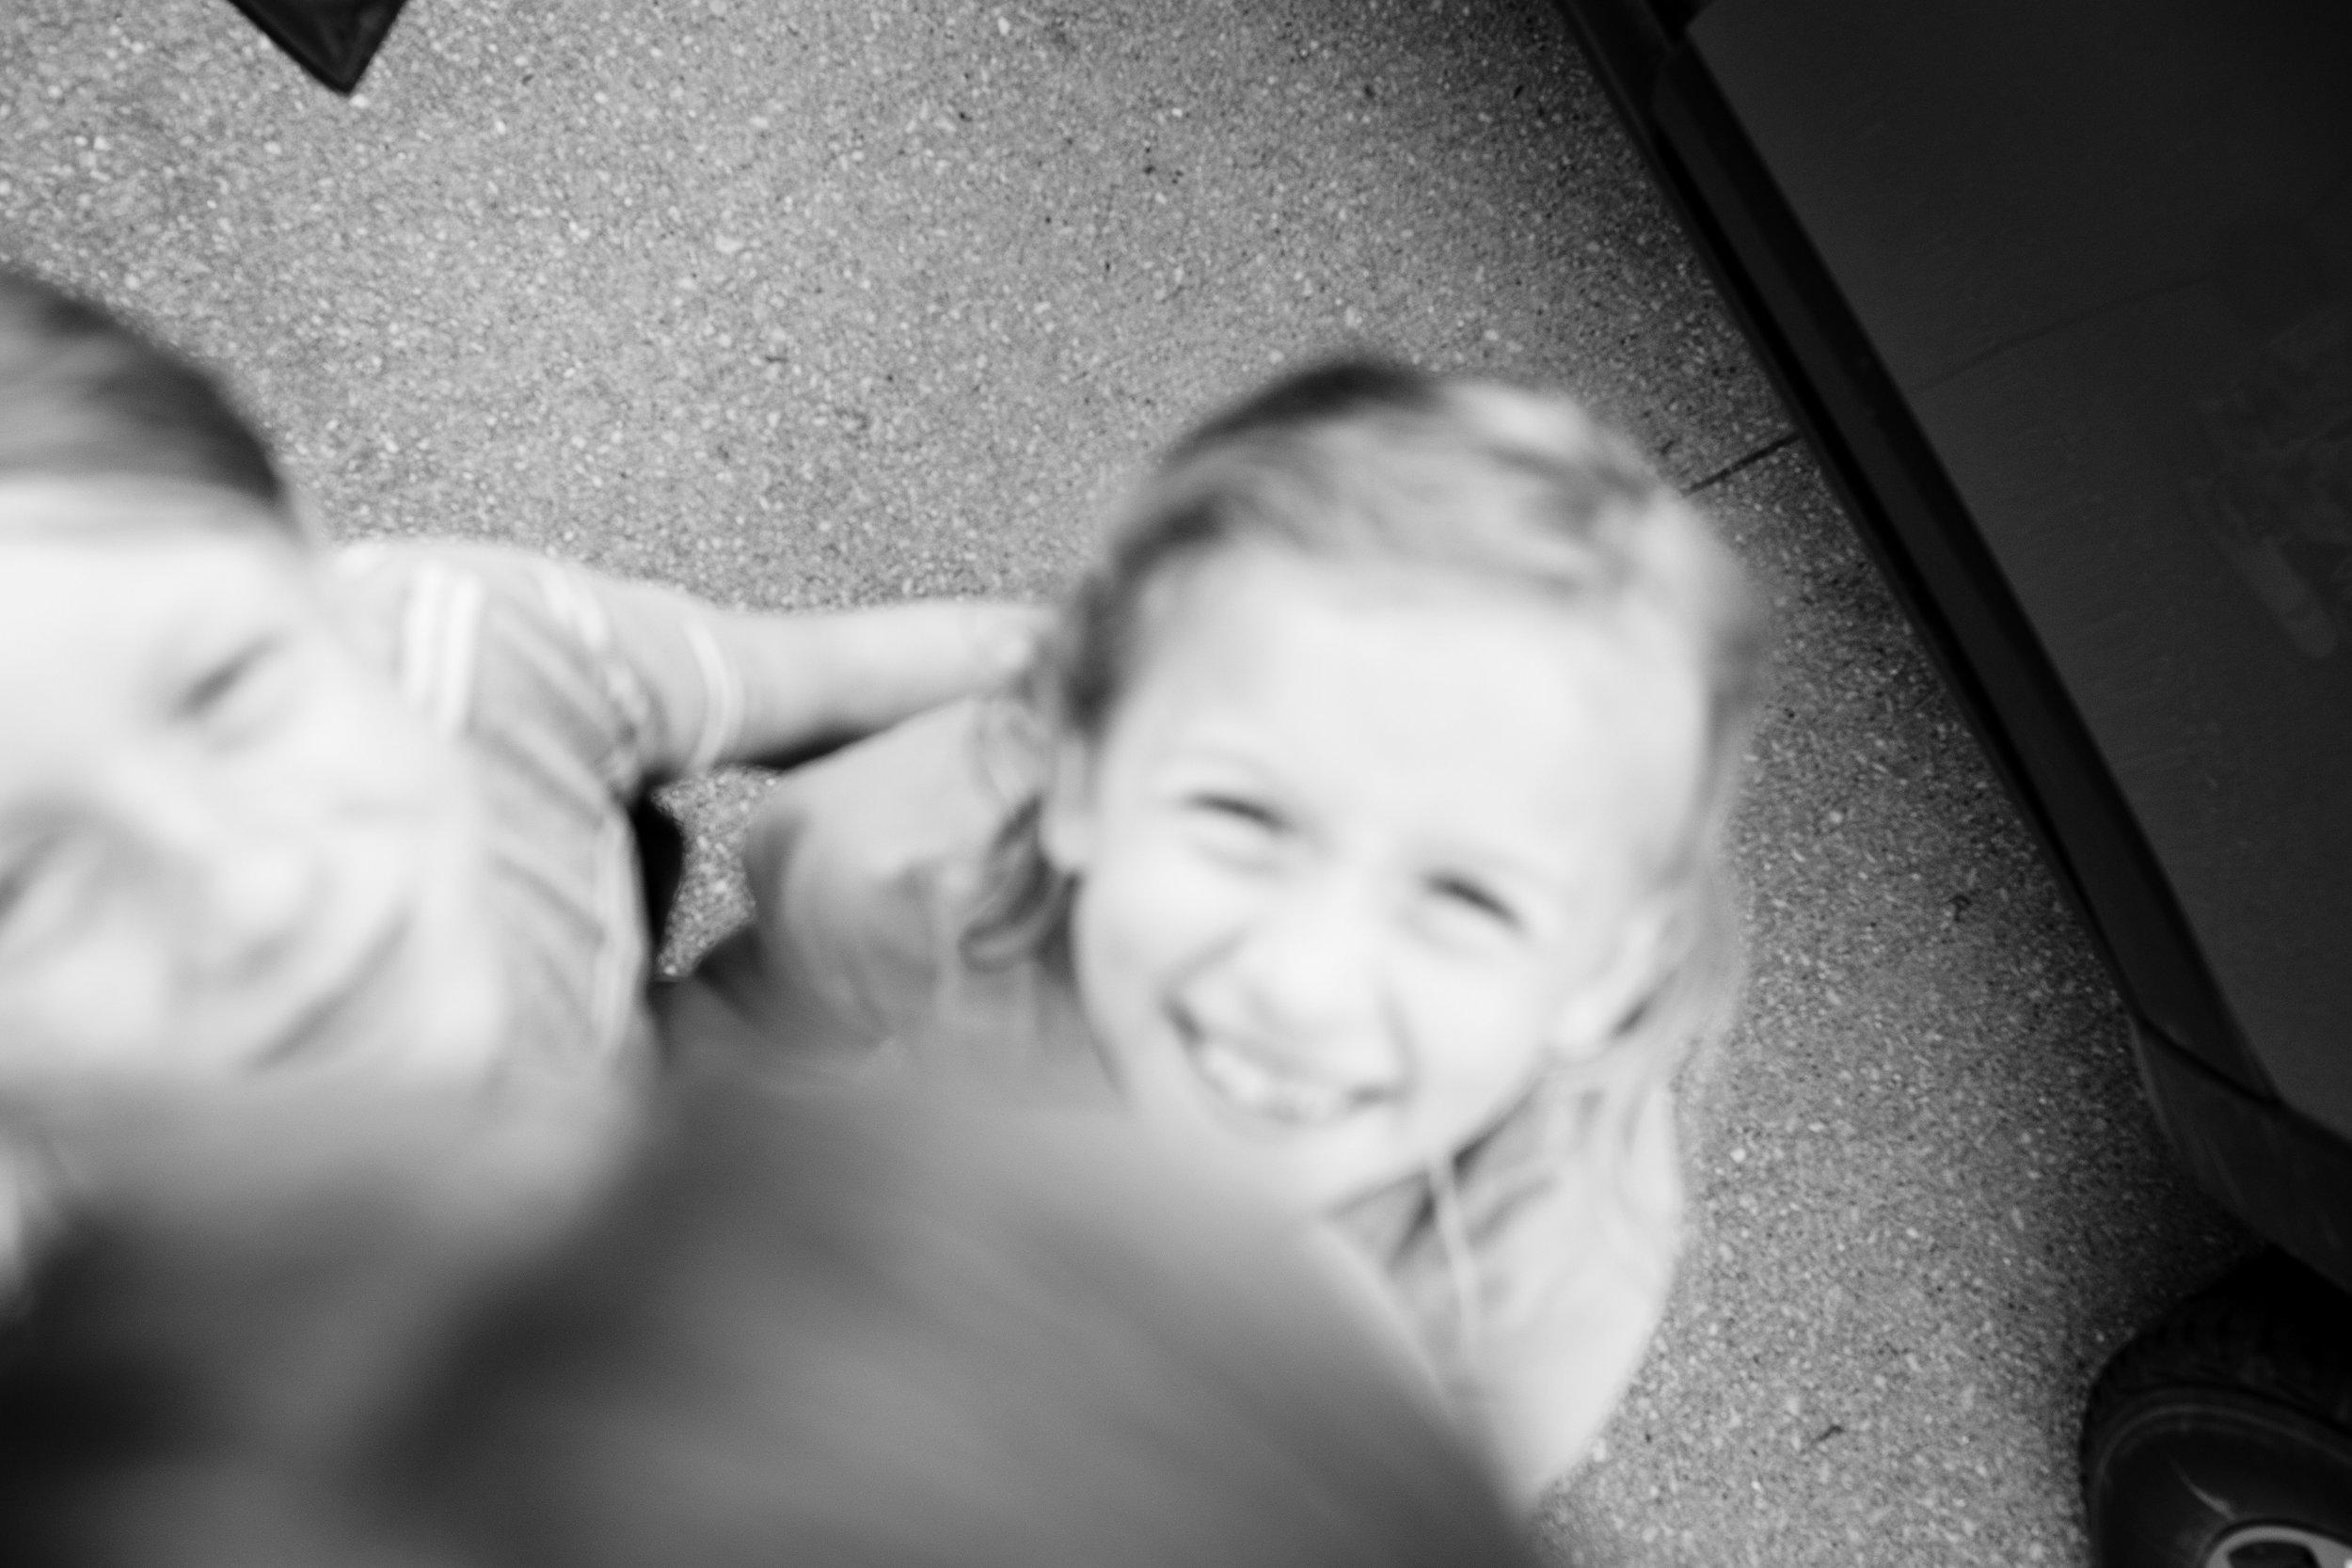 michigan-emotive-photographer-jessica-max-may-24.jpg